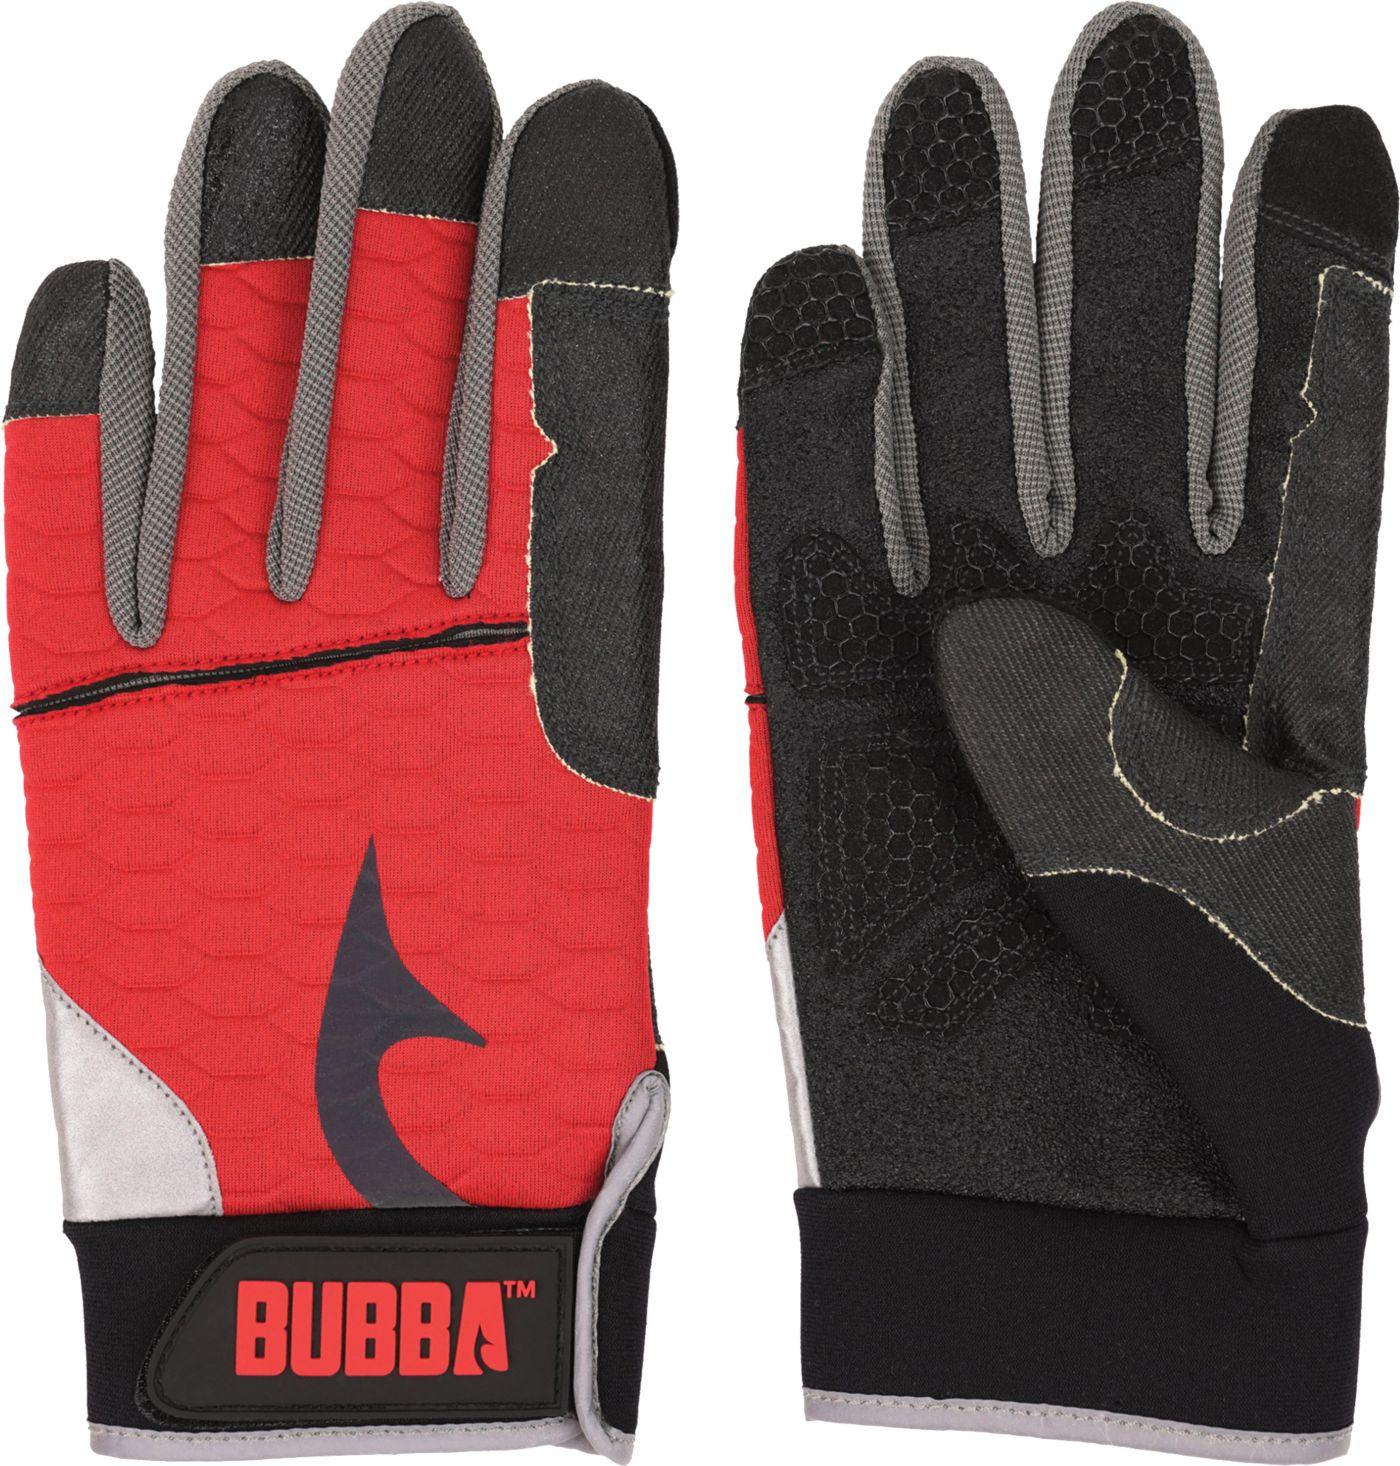 Bubble Blade Ultimate Fillet Gloves